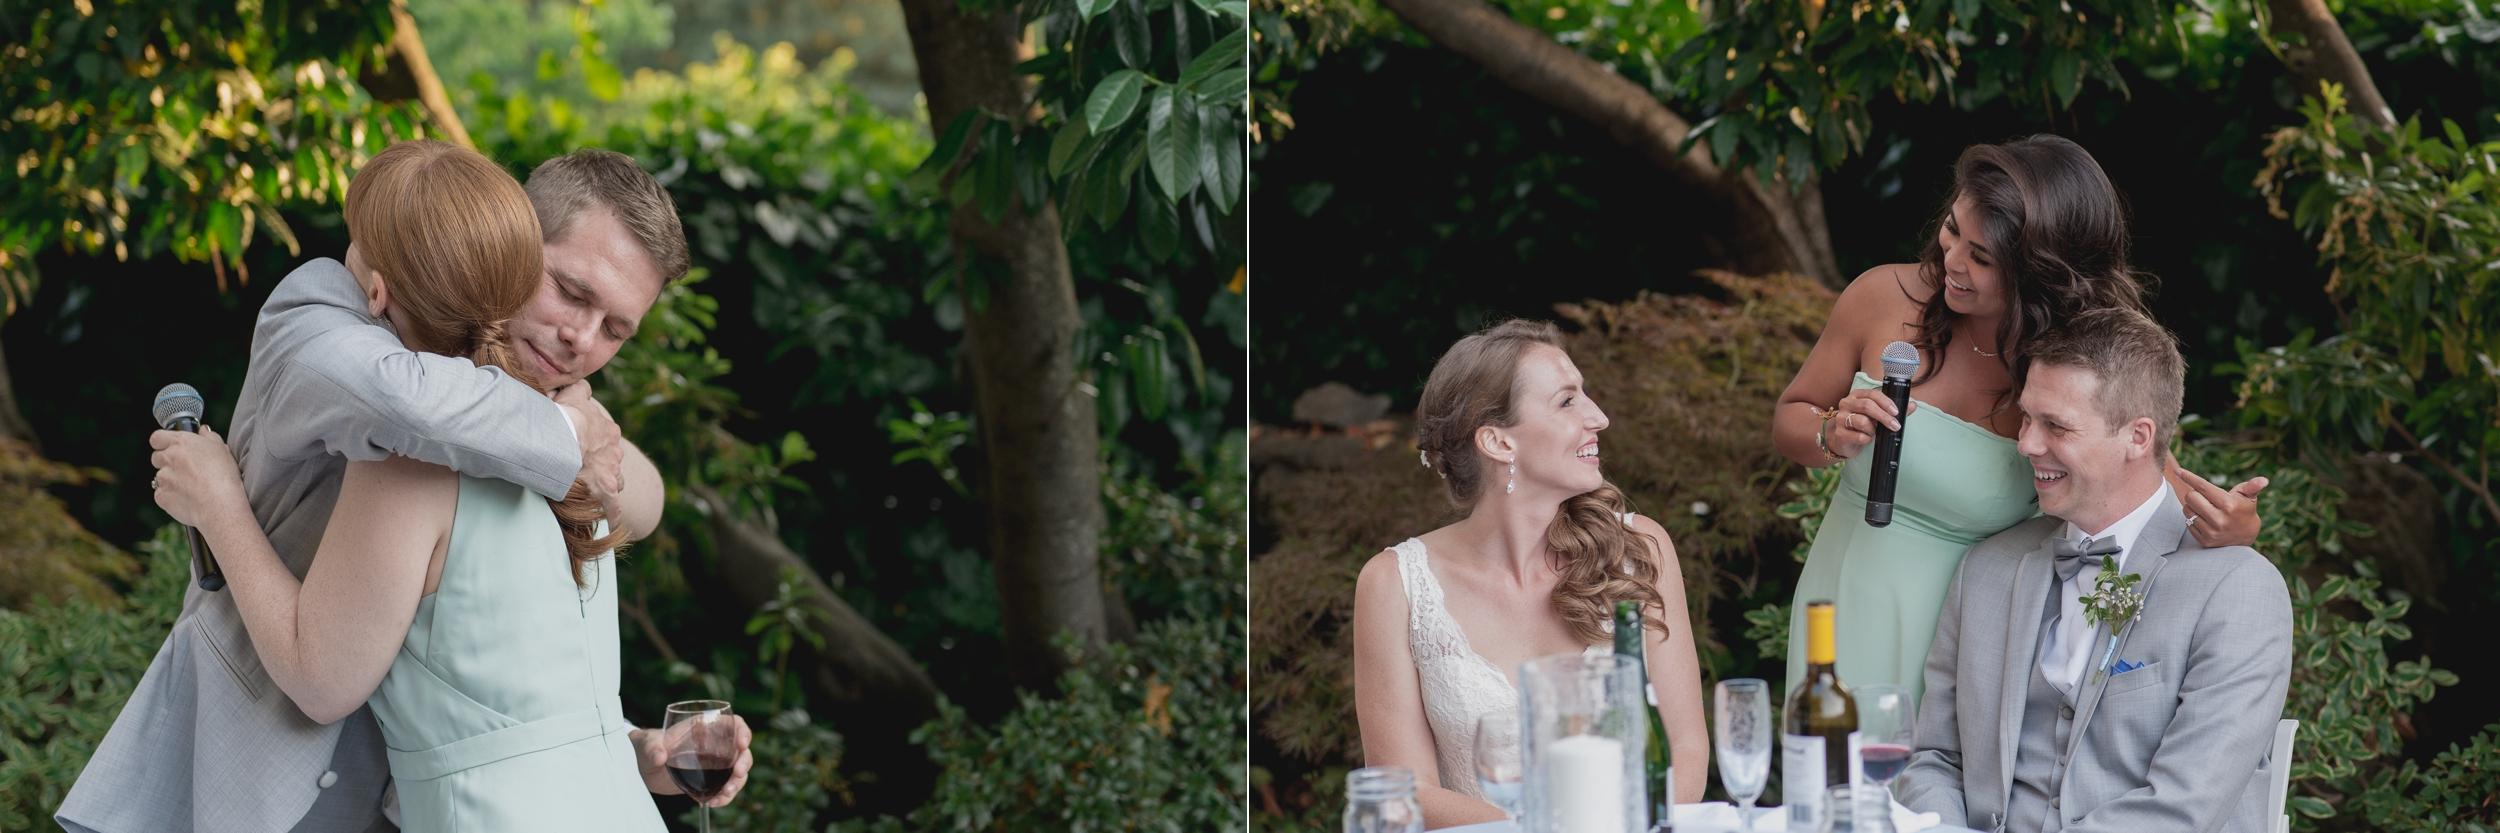 41-down-to-earth-marin-art-garden-center-wedding-vivianchen.jpg